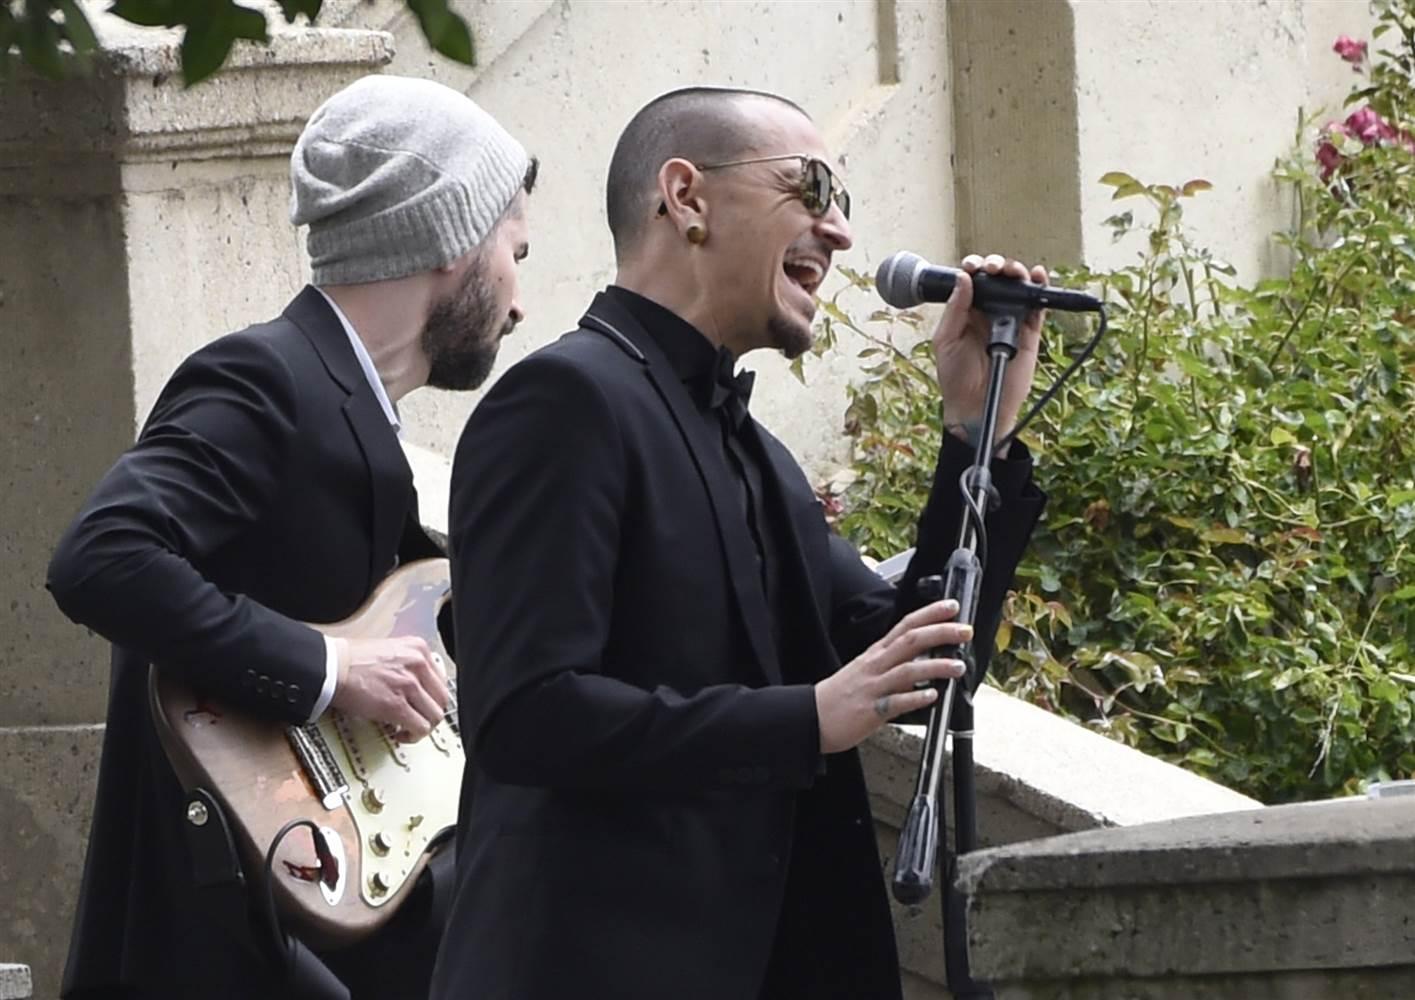 Chester cantando en el funeral de Chris